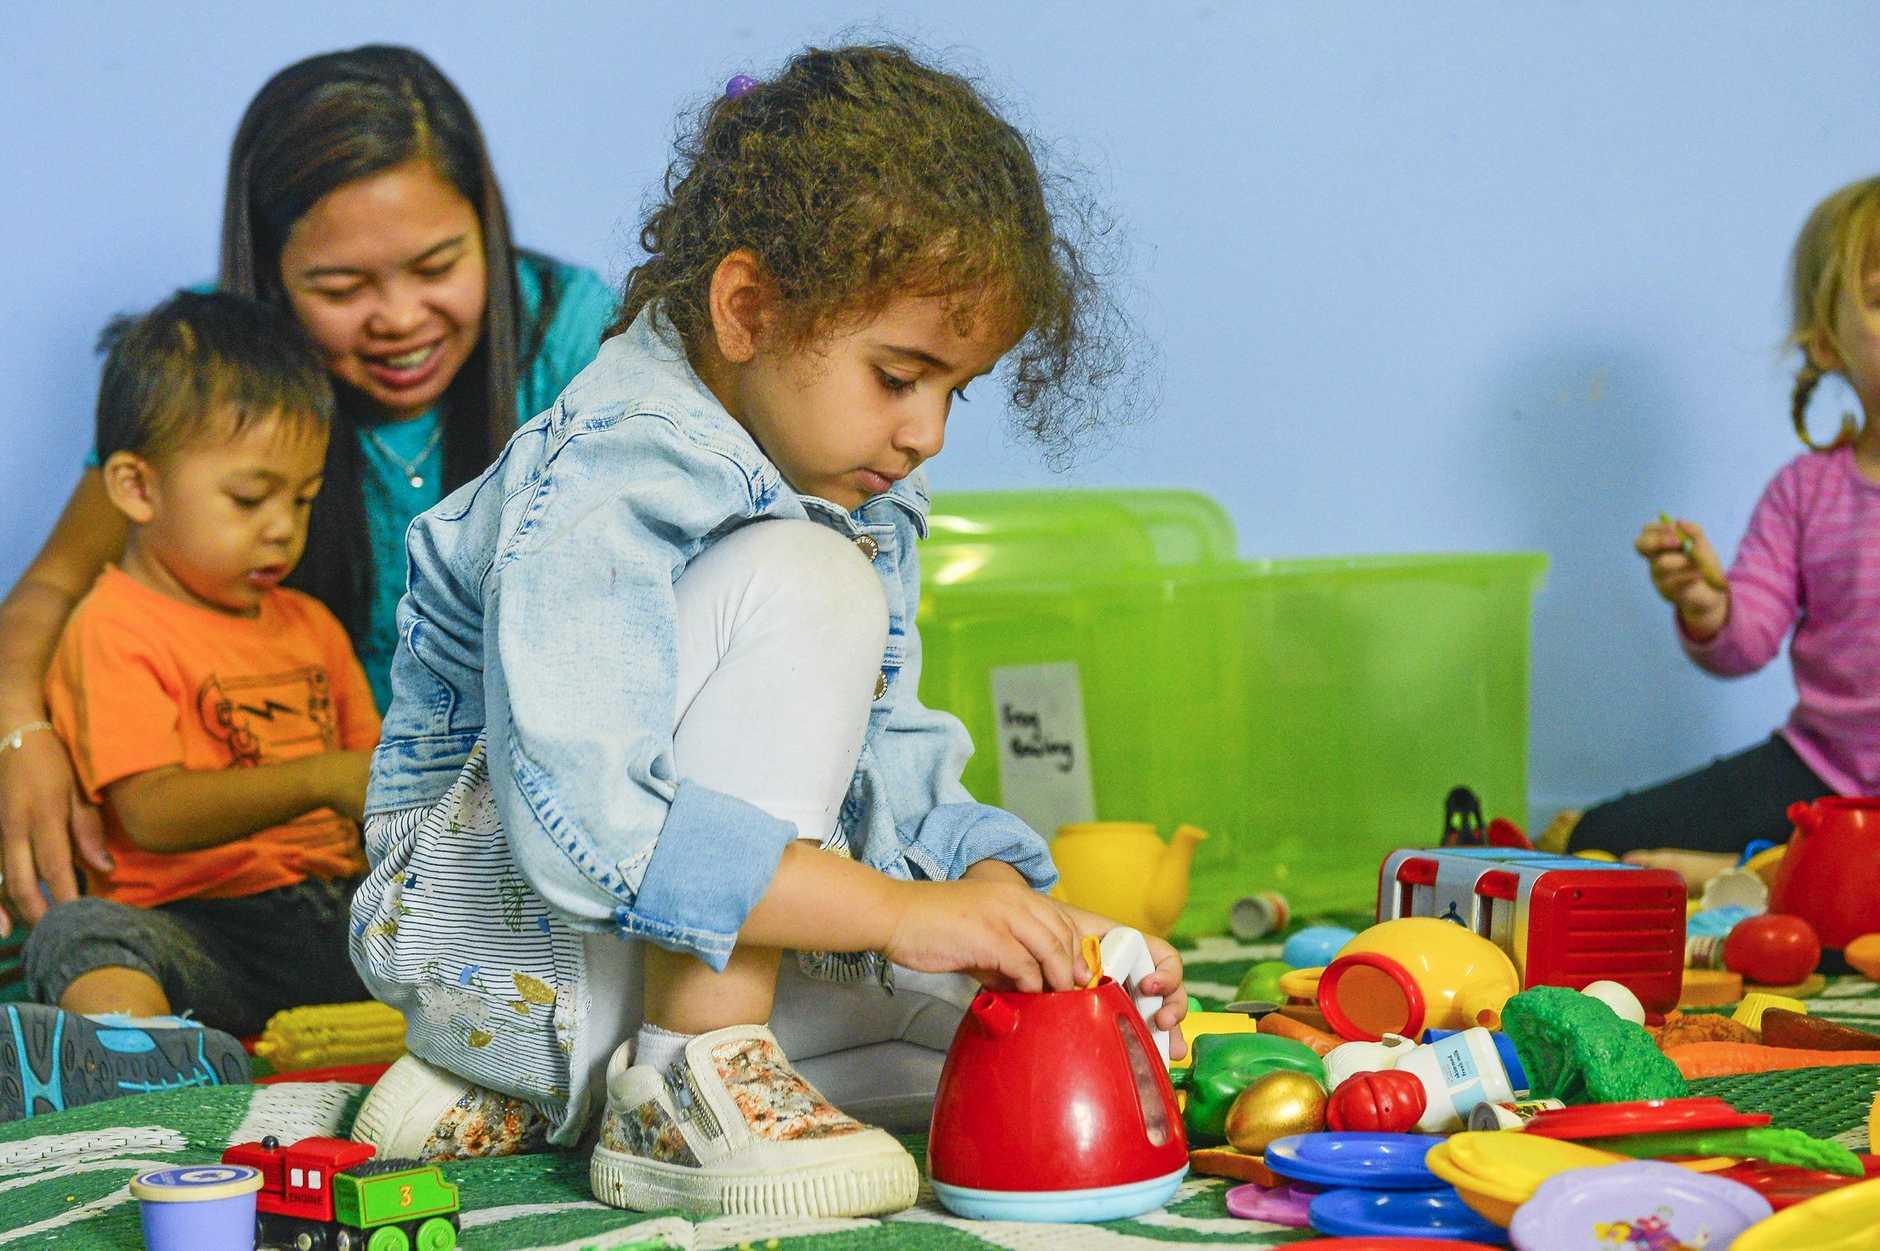 UNDER 8S WEEK: Jenna at Gladstone's GAPDL Communities for children precinct.